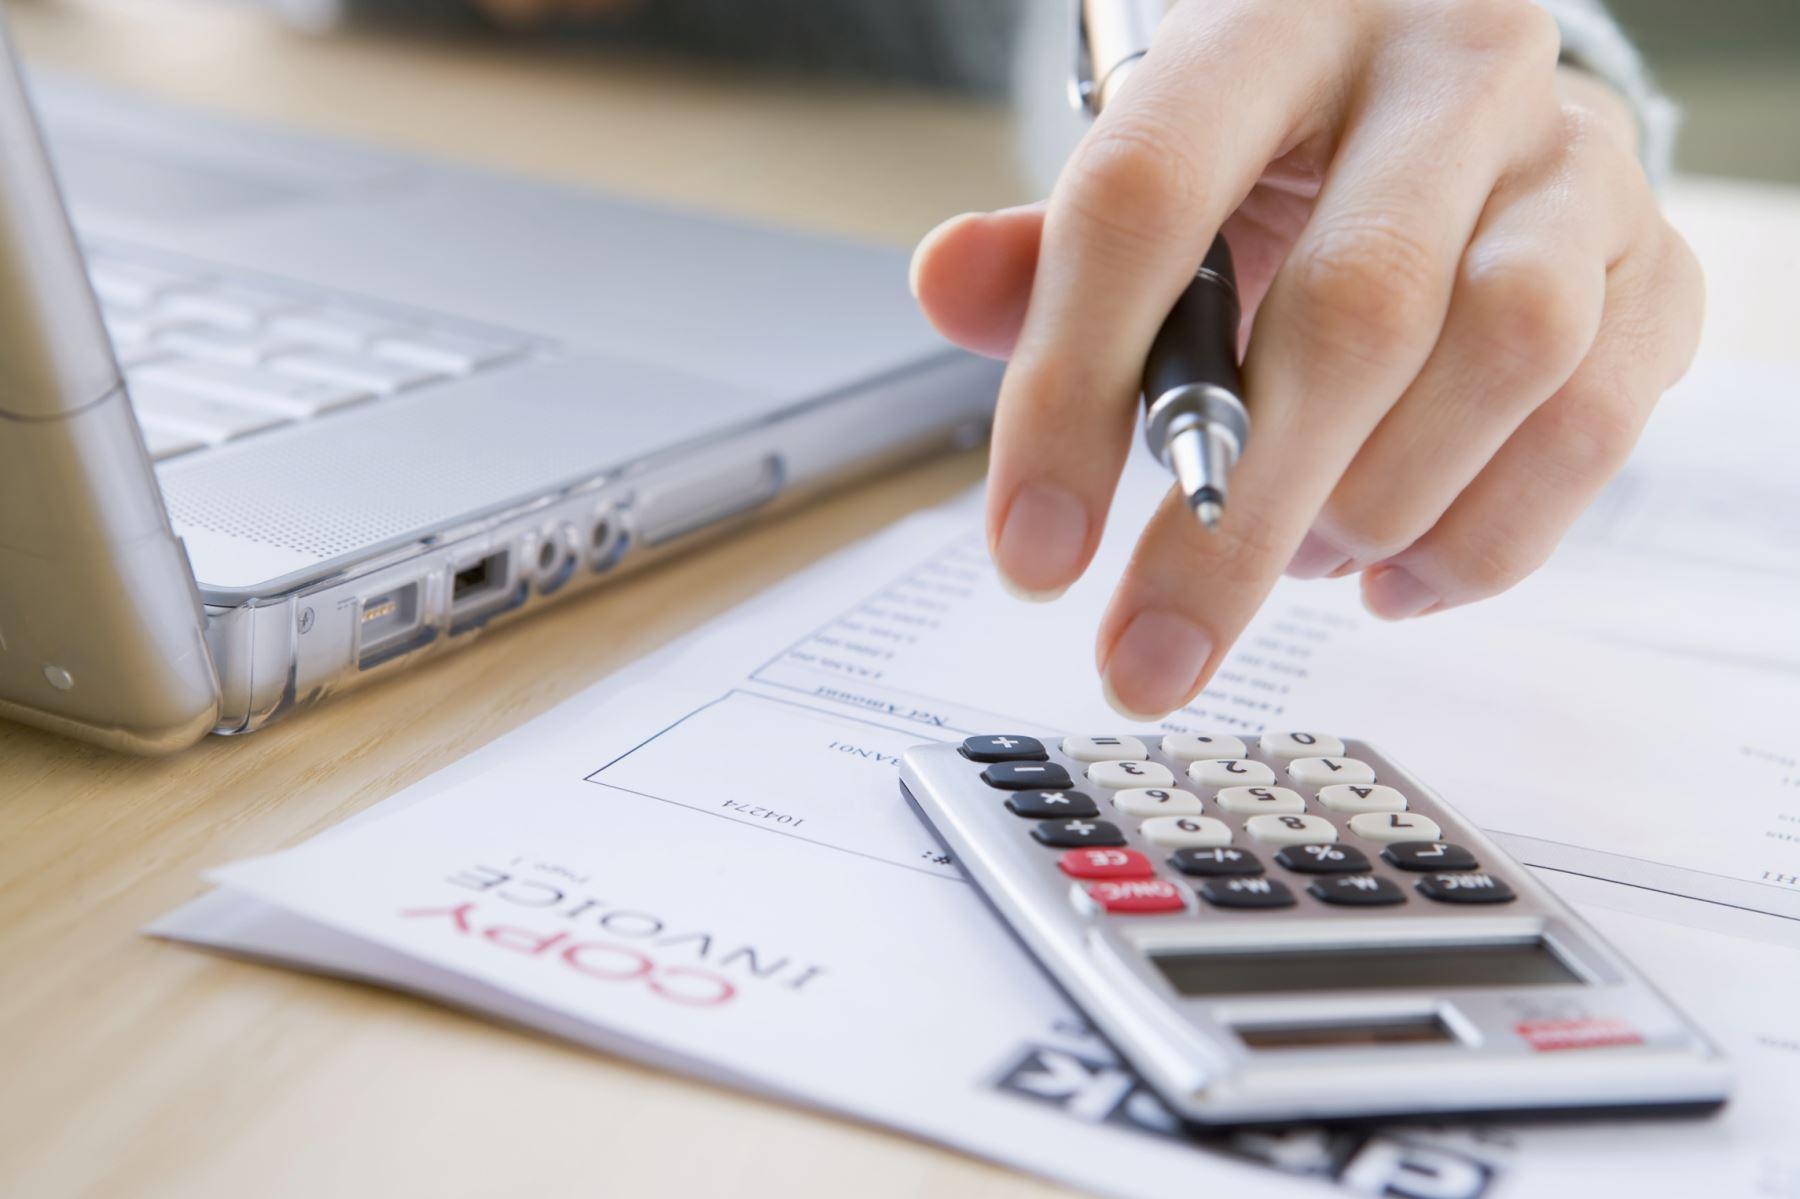 Pago de facturas: Se extienden plazos